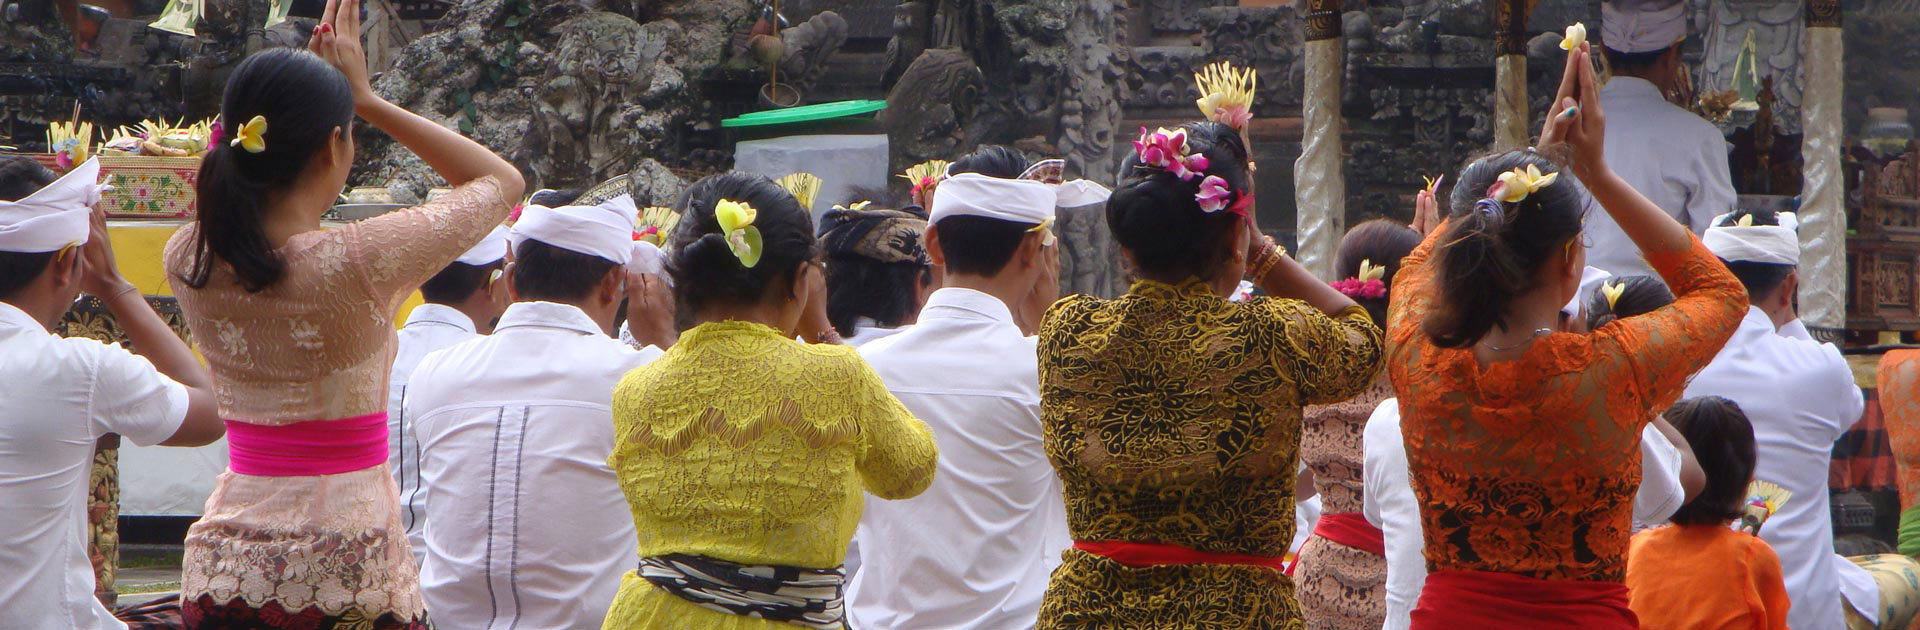 ID Bali Circuito Interior 10 días 3